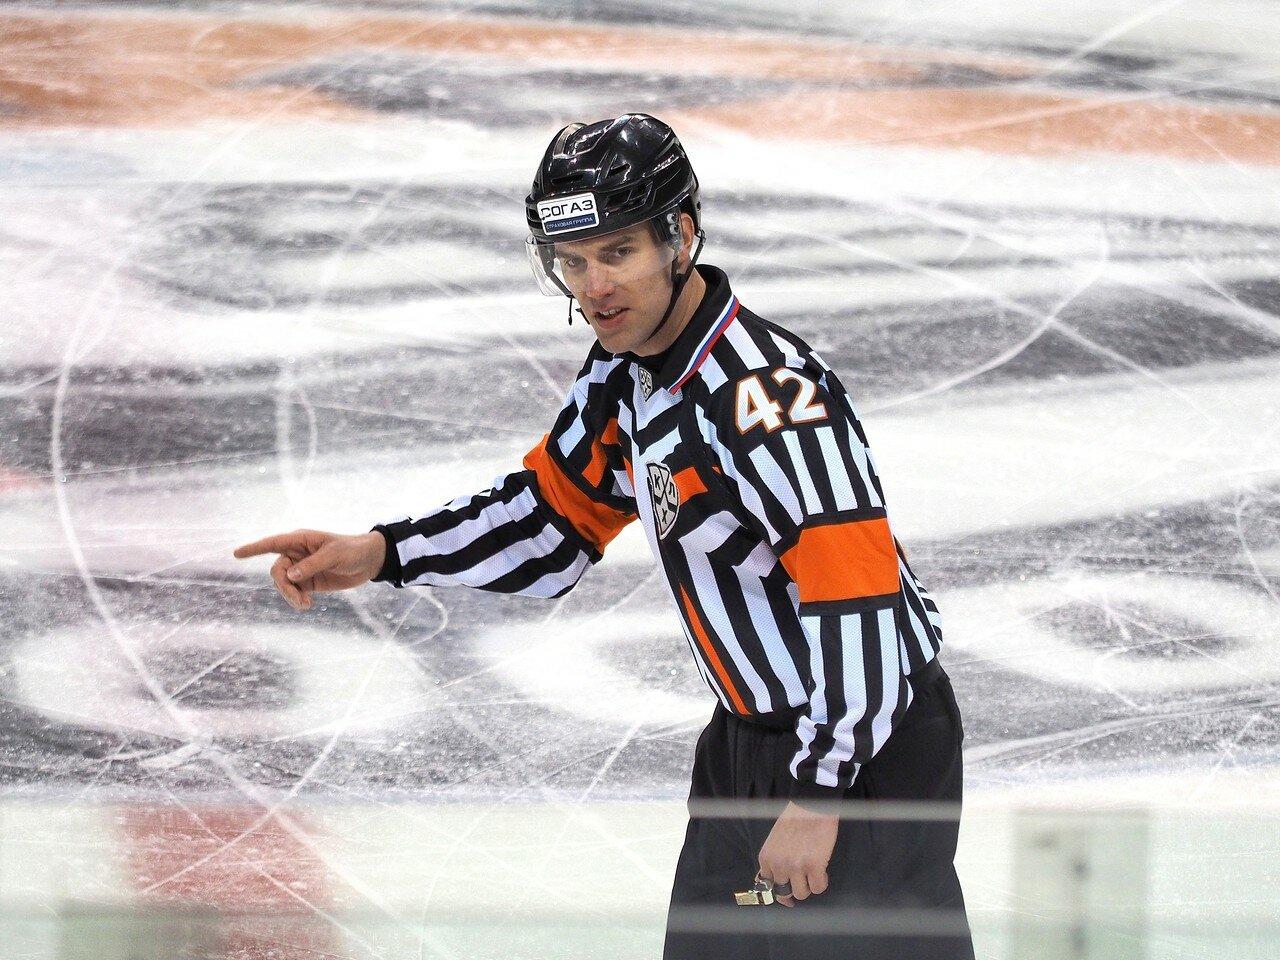 44Плей-офф 2016 Восток 1/2 Металлург - Сибирь 16.03.2016